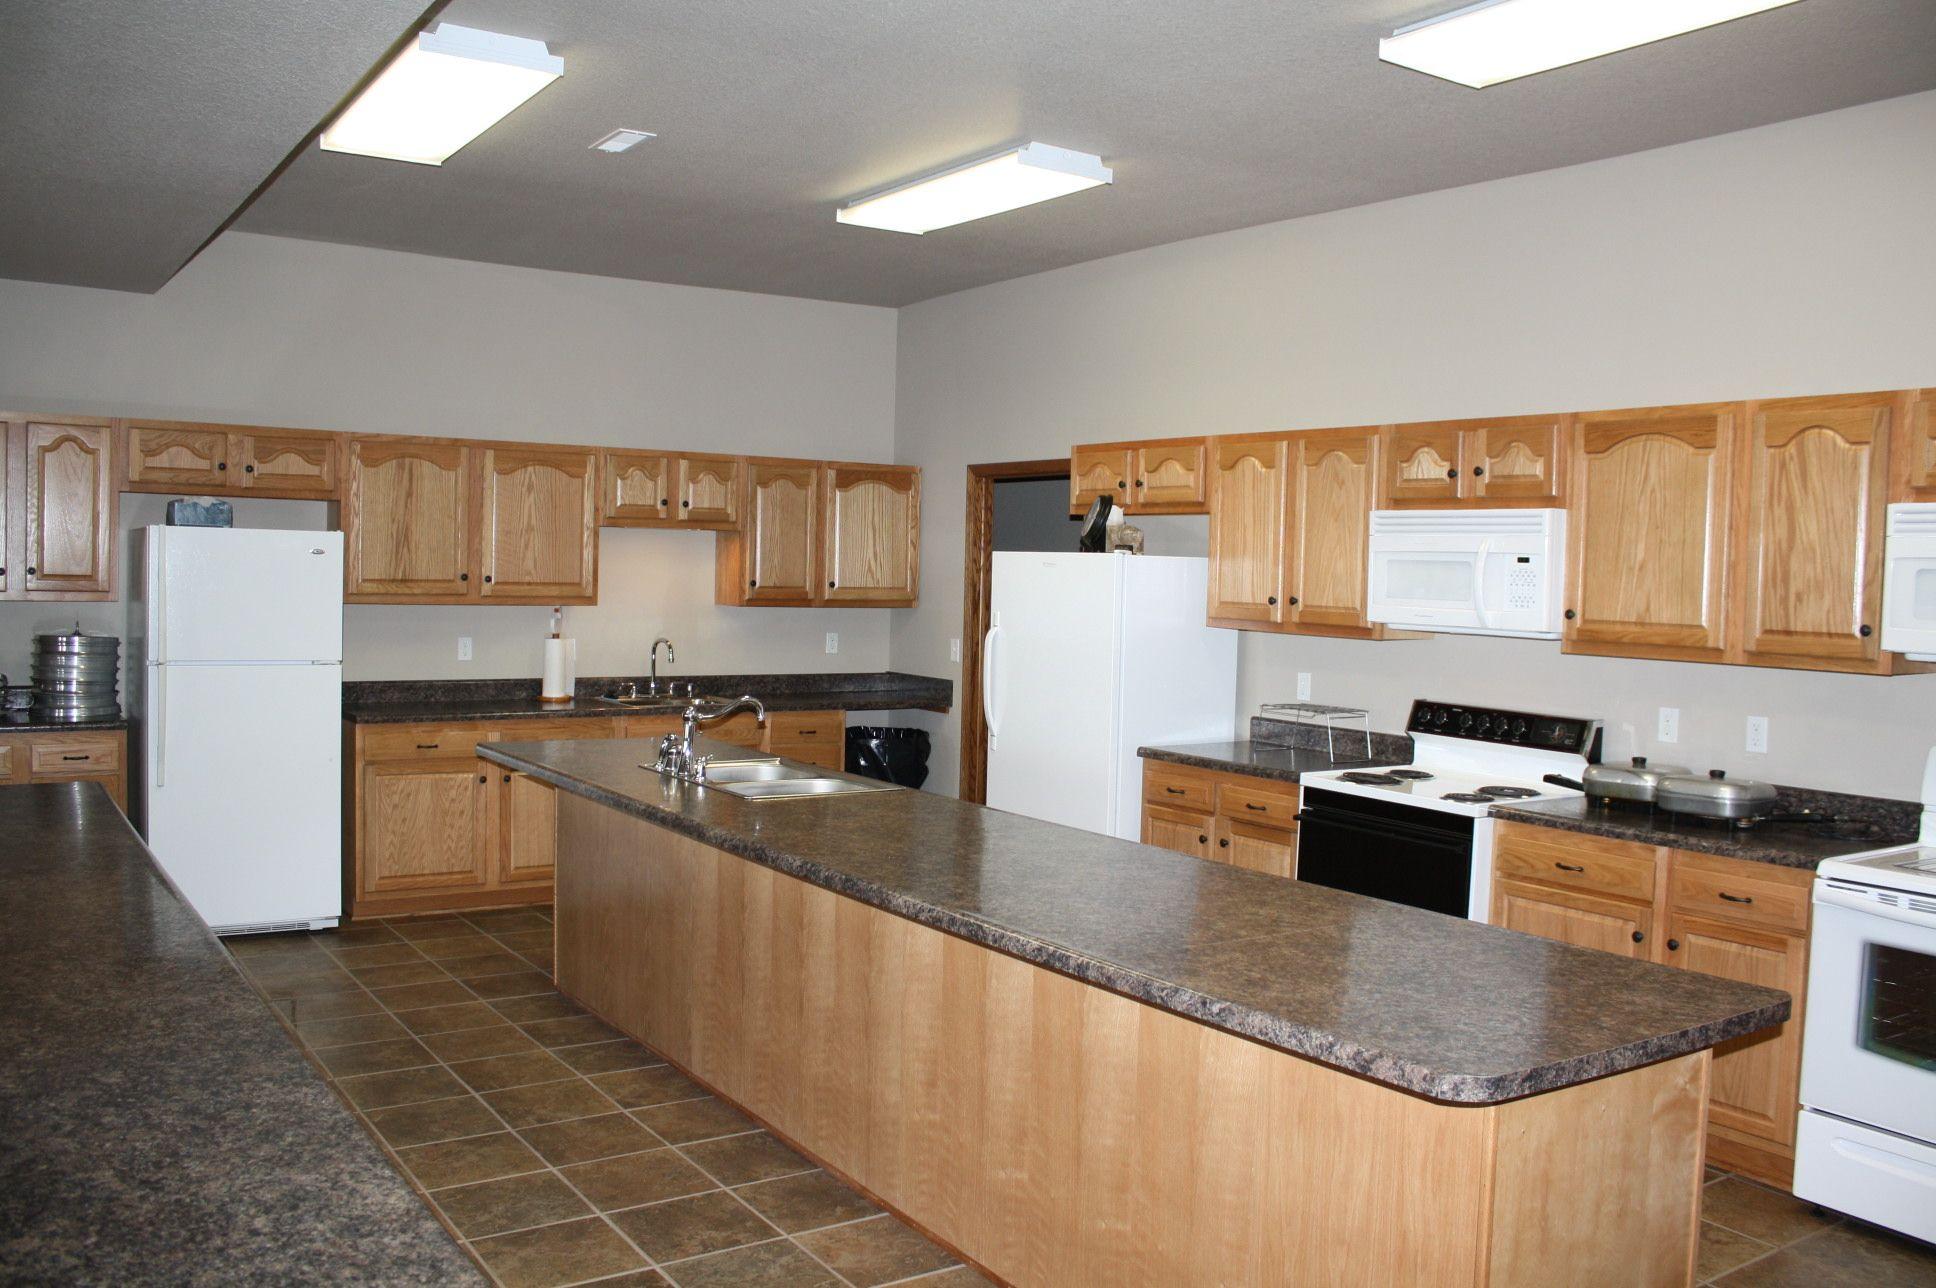 Uncategorized Church Kitchen Design awesome traditional church kitchen design ideas jesus centre ideas